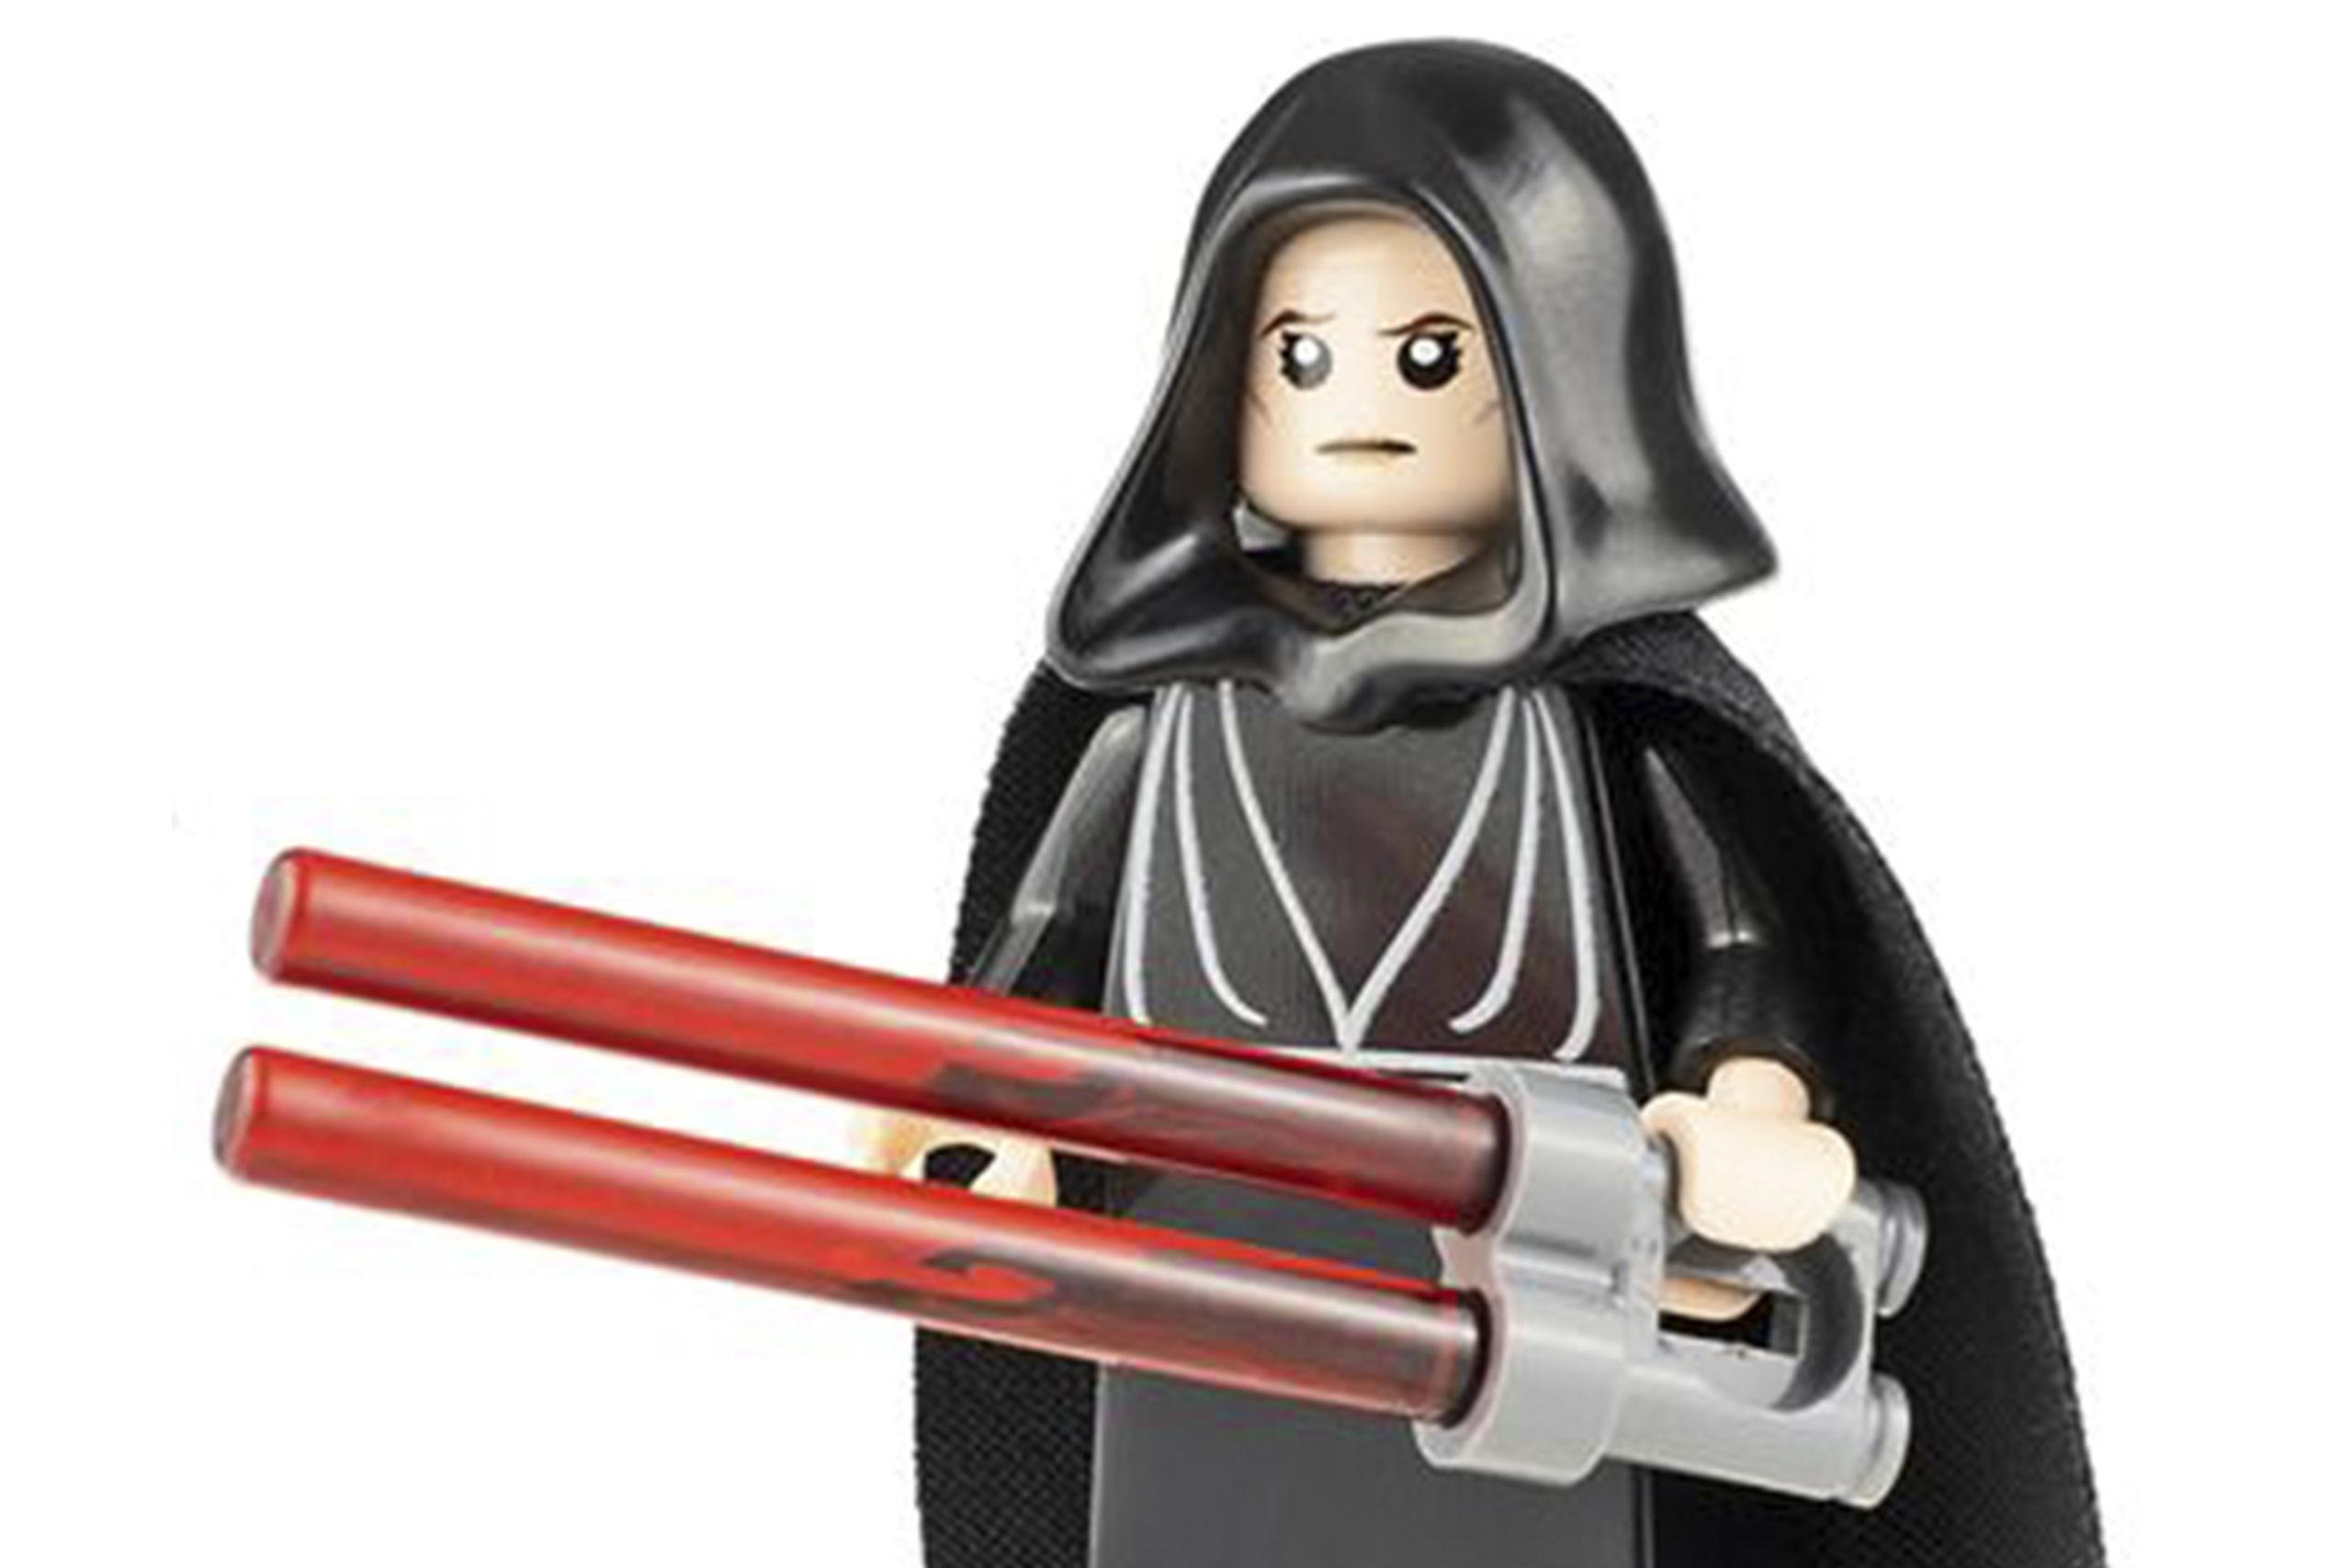 Dark Rey Minifigure